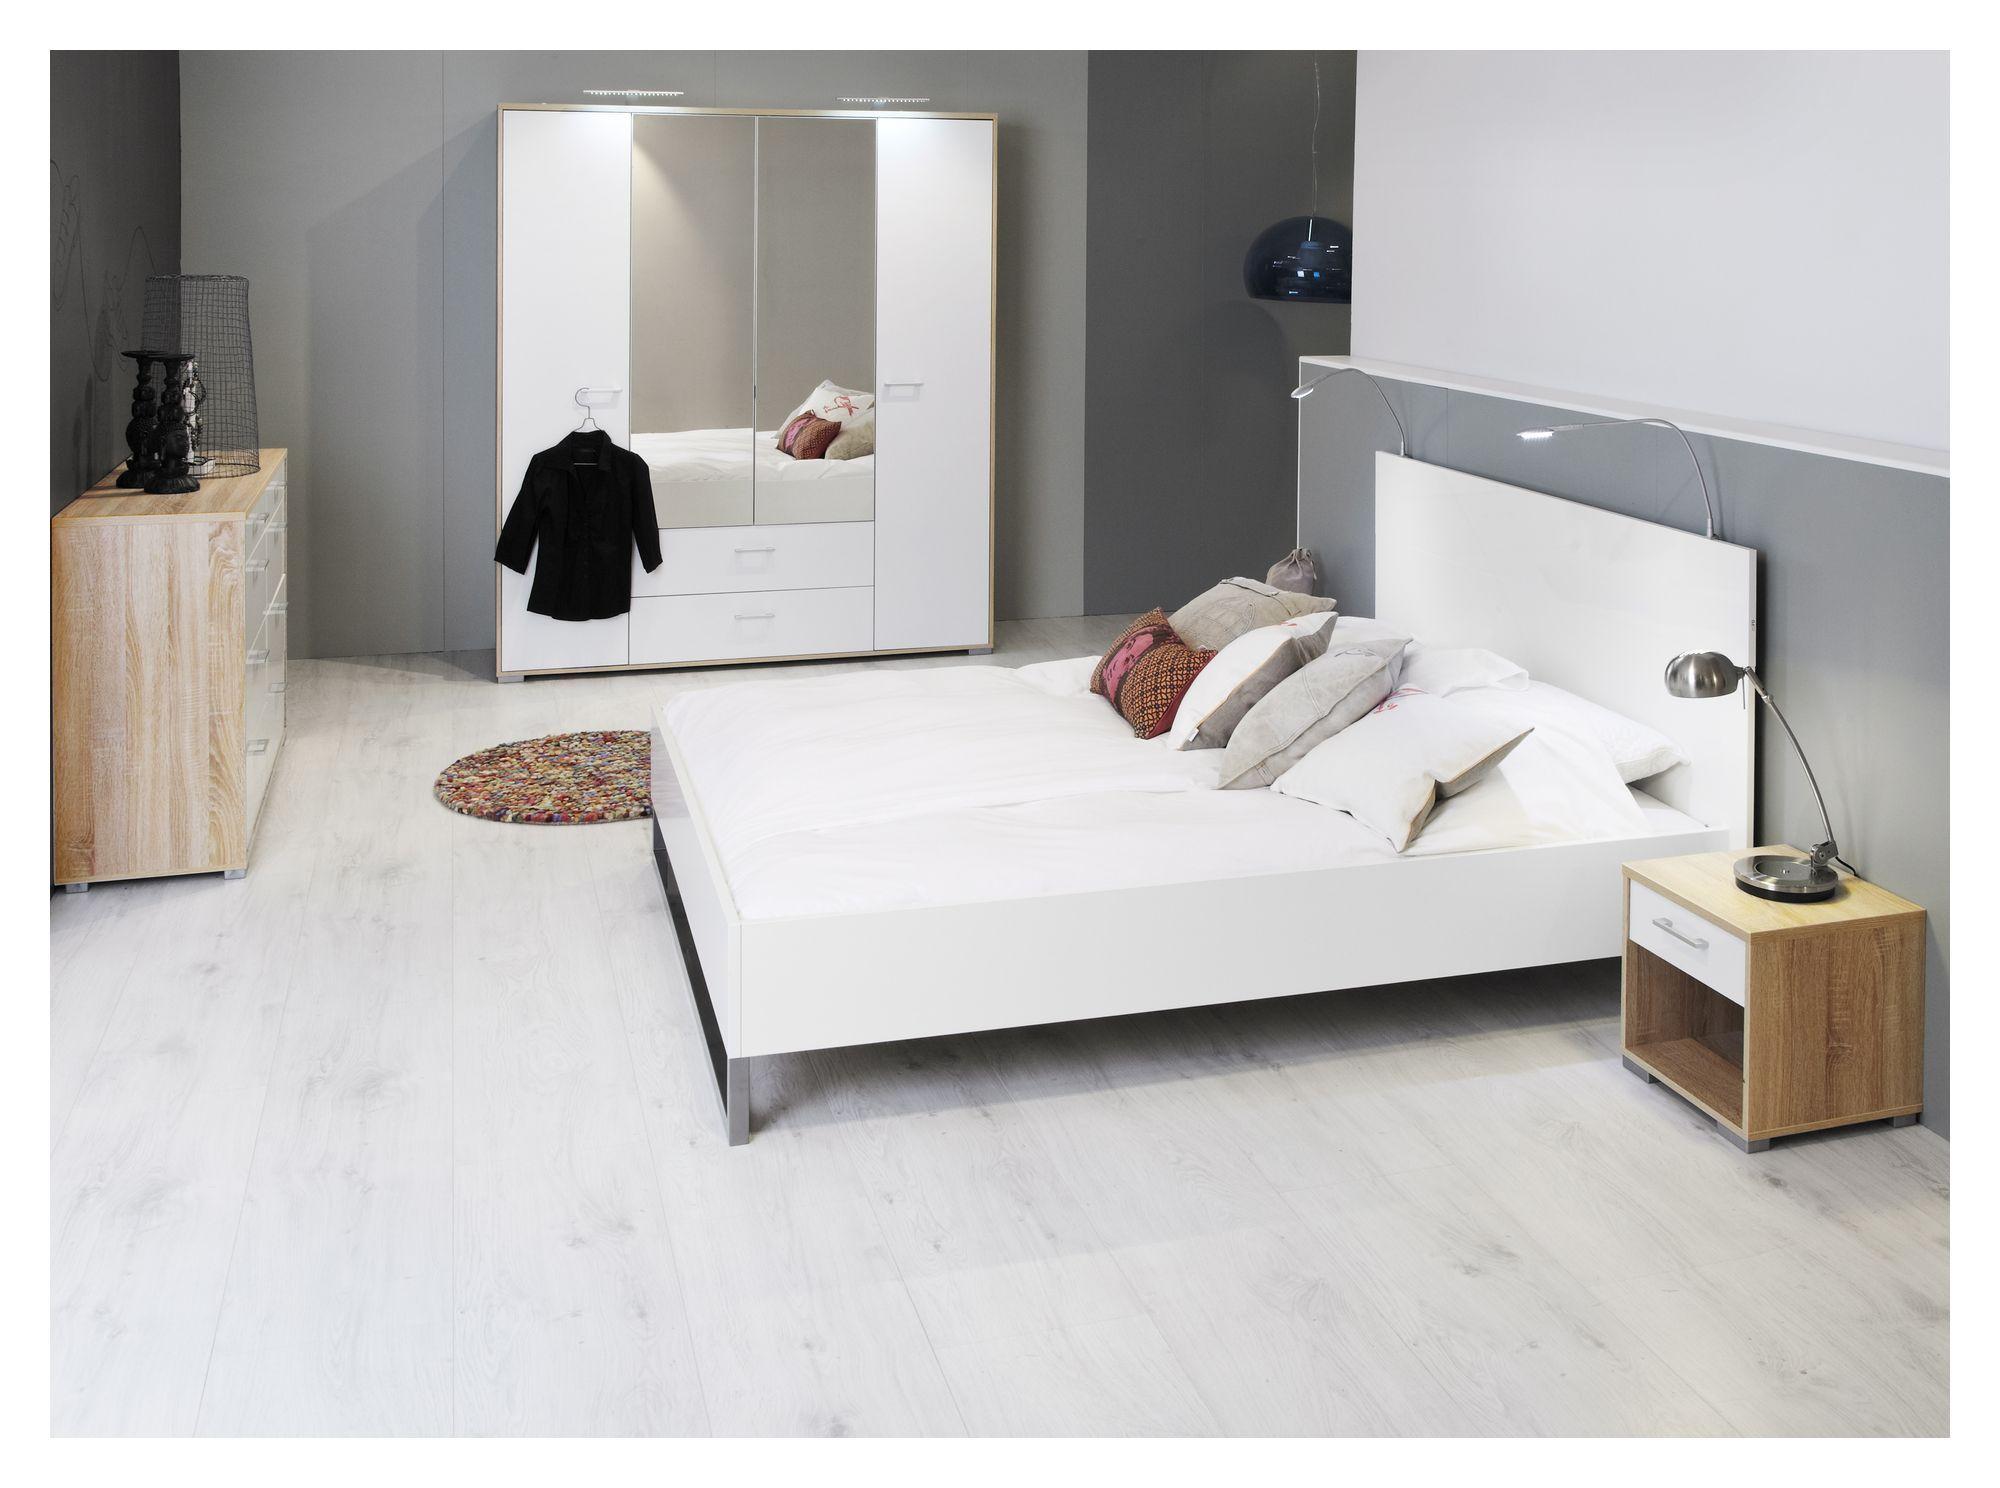 Style Sengeramme - Hvid 180x200 - Hvid seng - 180x200 cm